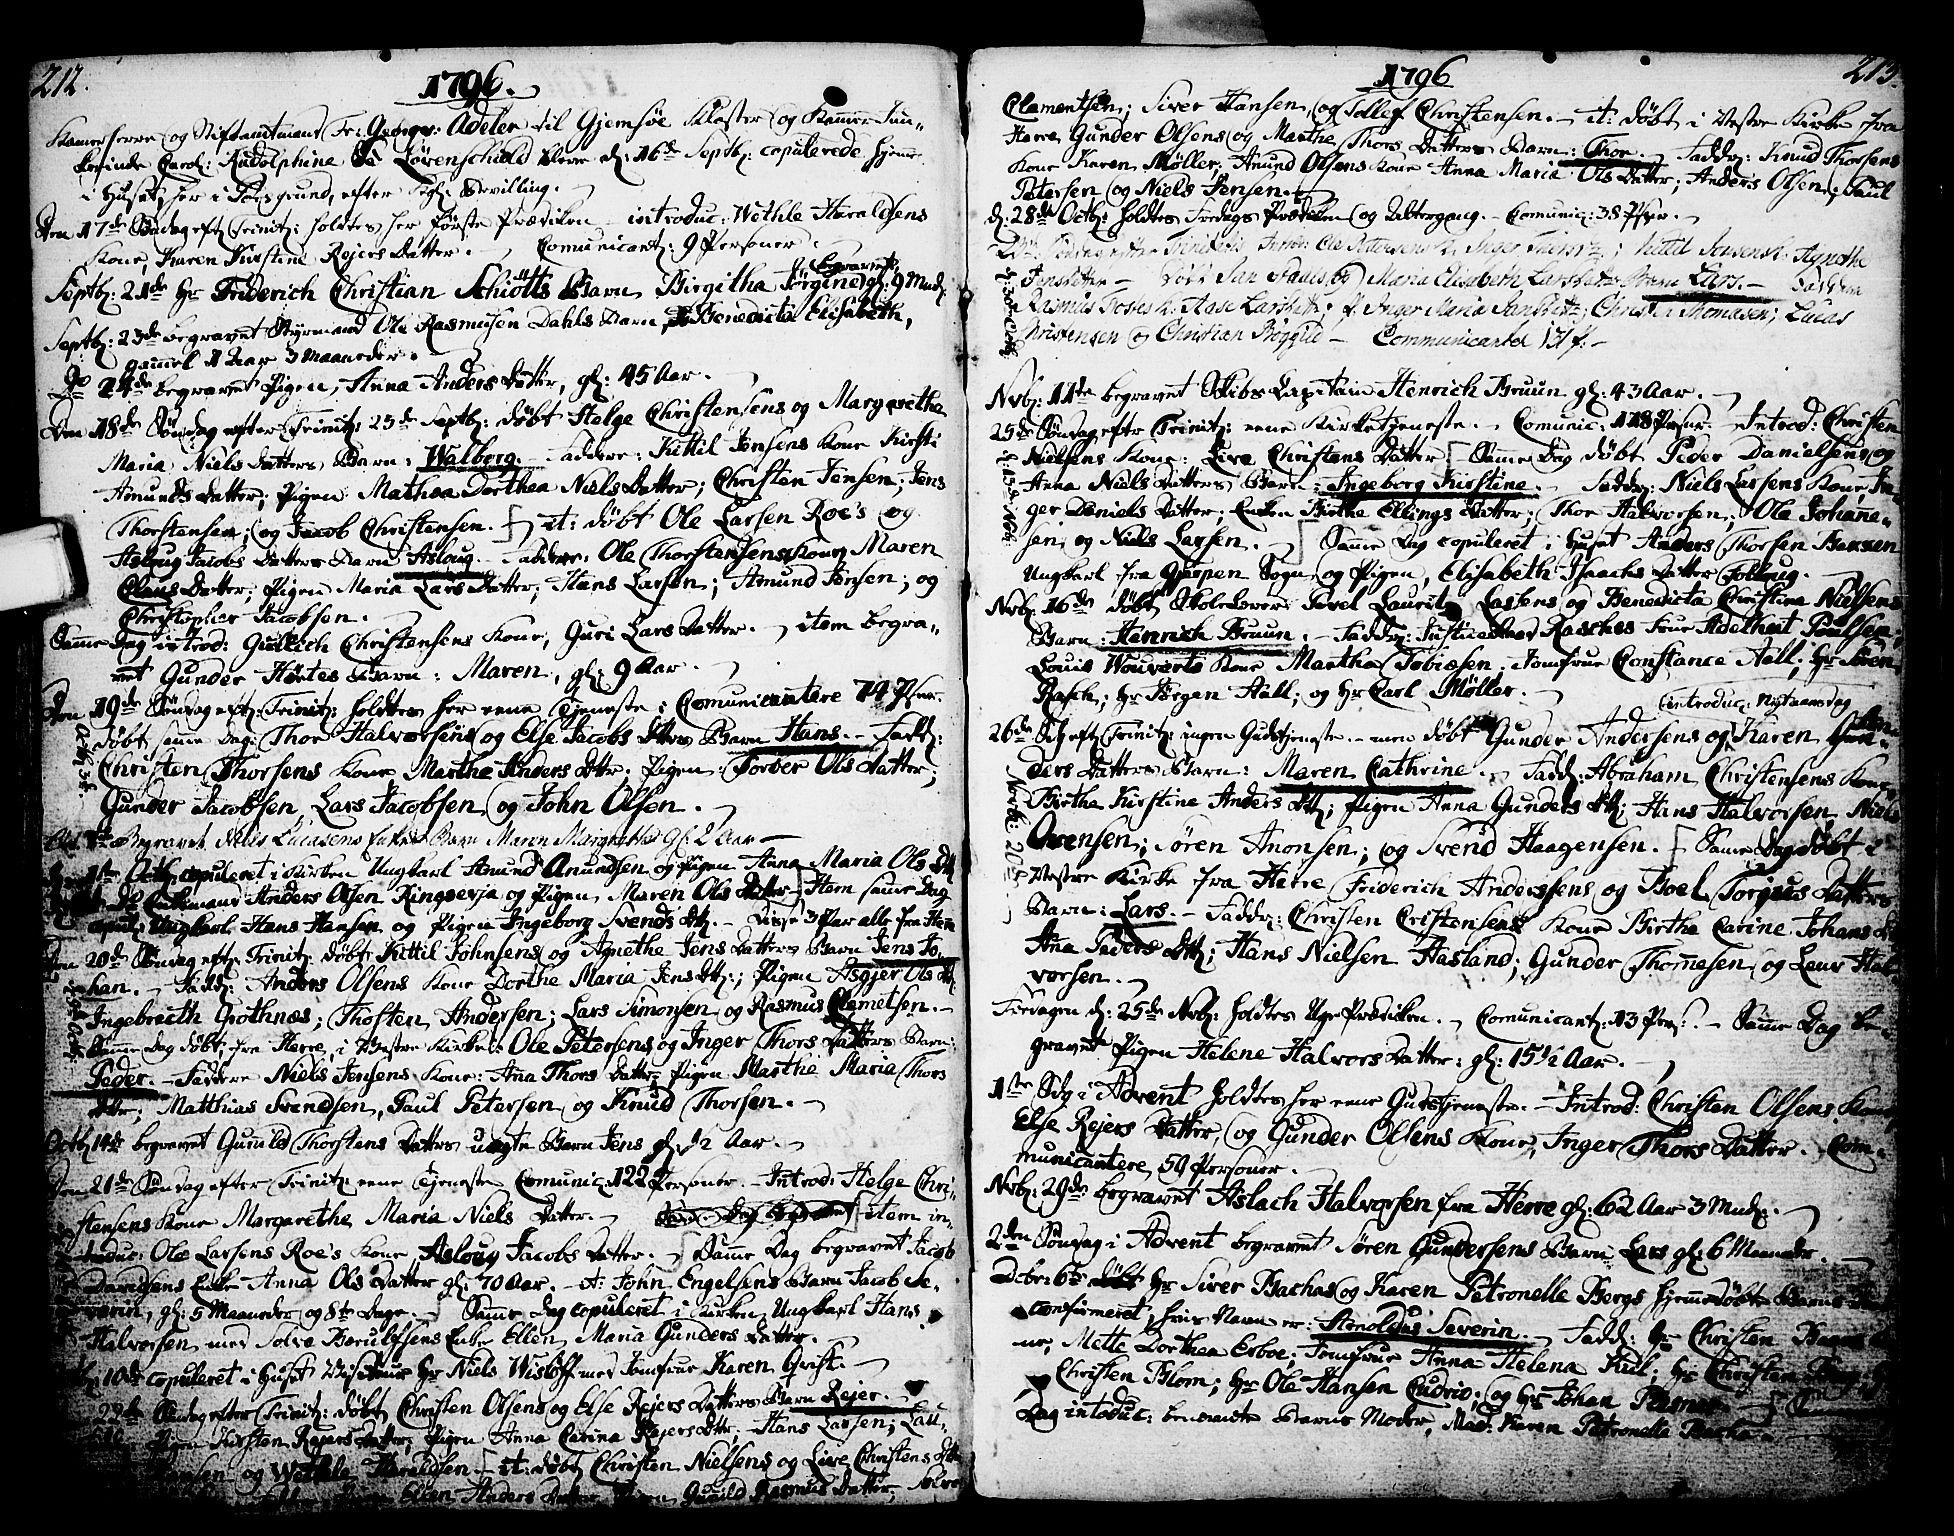 SAKO, Porsgrunn kirkebøker , F/Fa/L0002: Parish register (official) no. 2, 1764-1814, p. 212-213